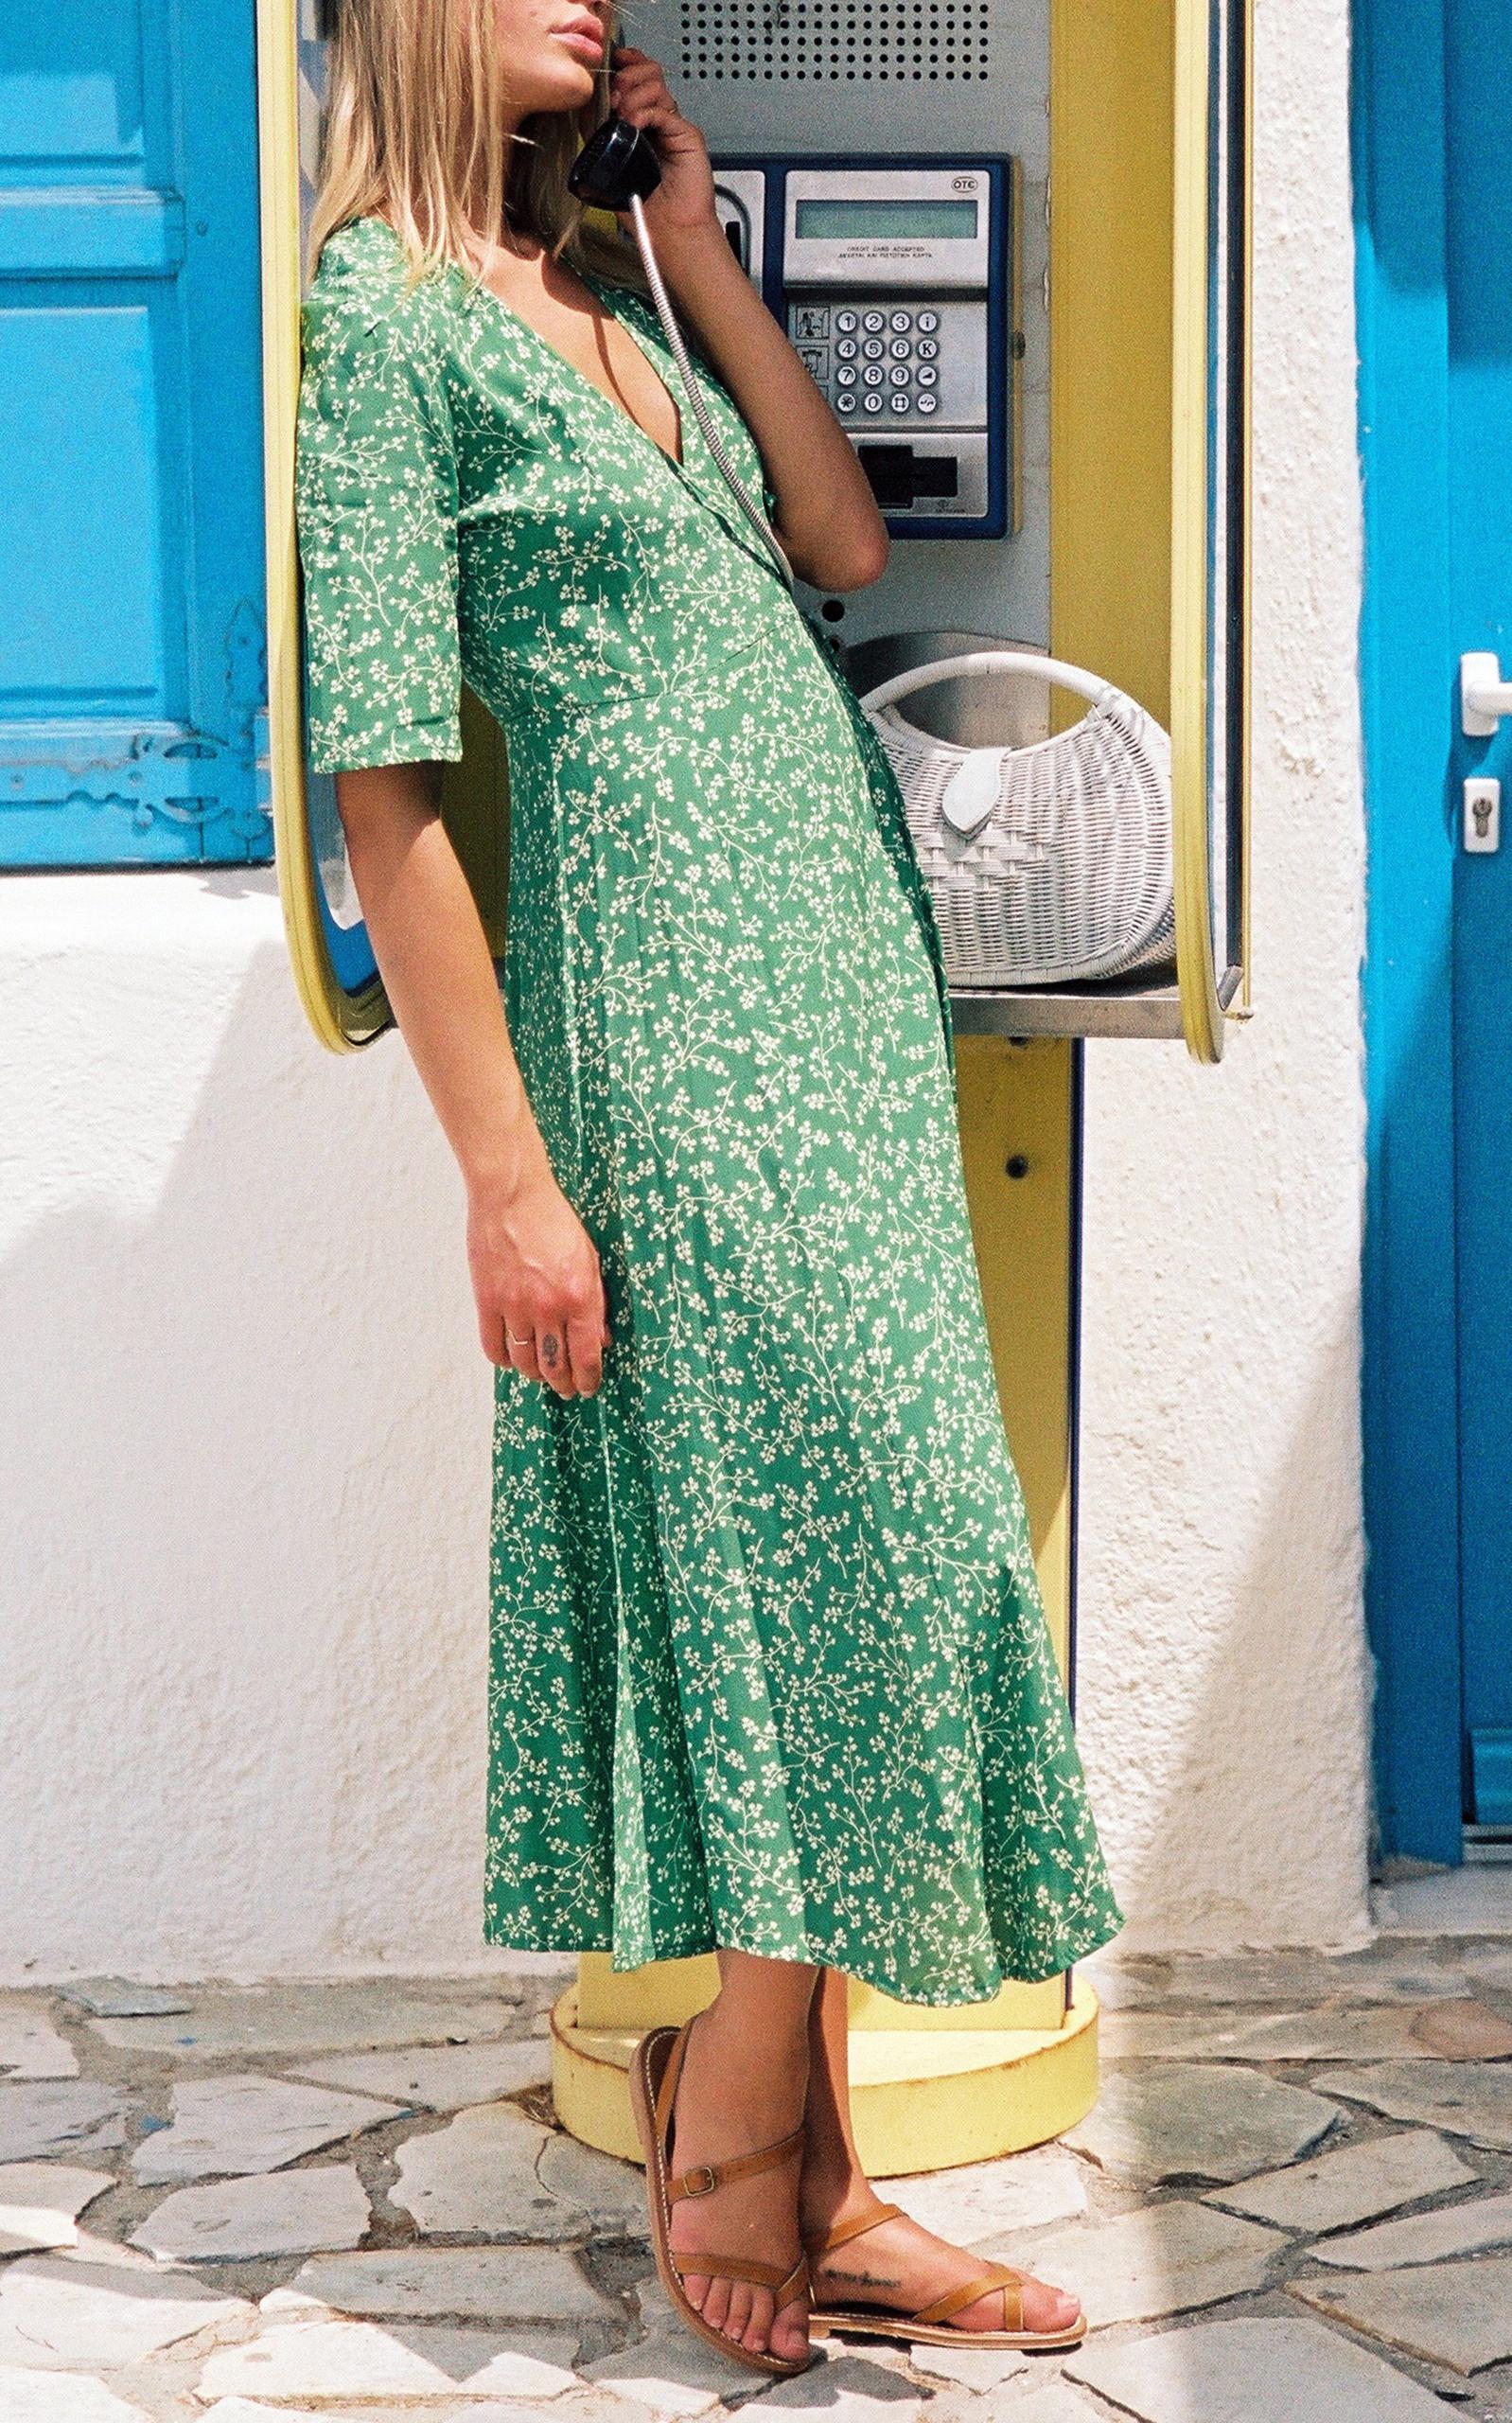 87afec0e1d08 Lyst - Faithfull The Brand Rivera Midi Dress in Green